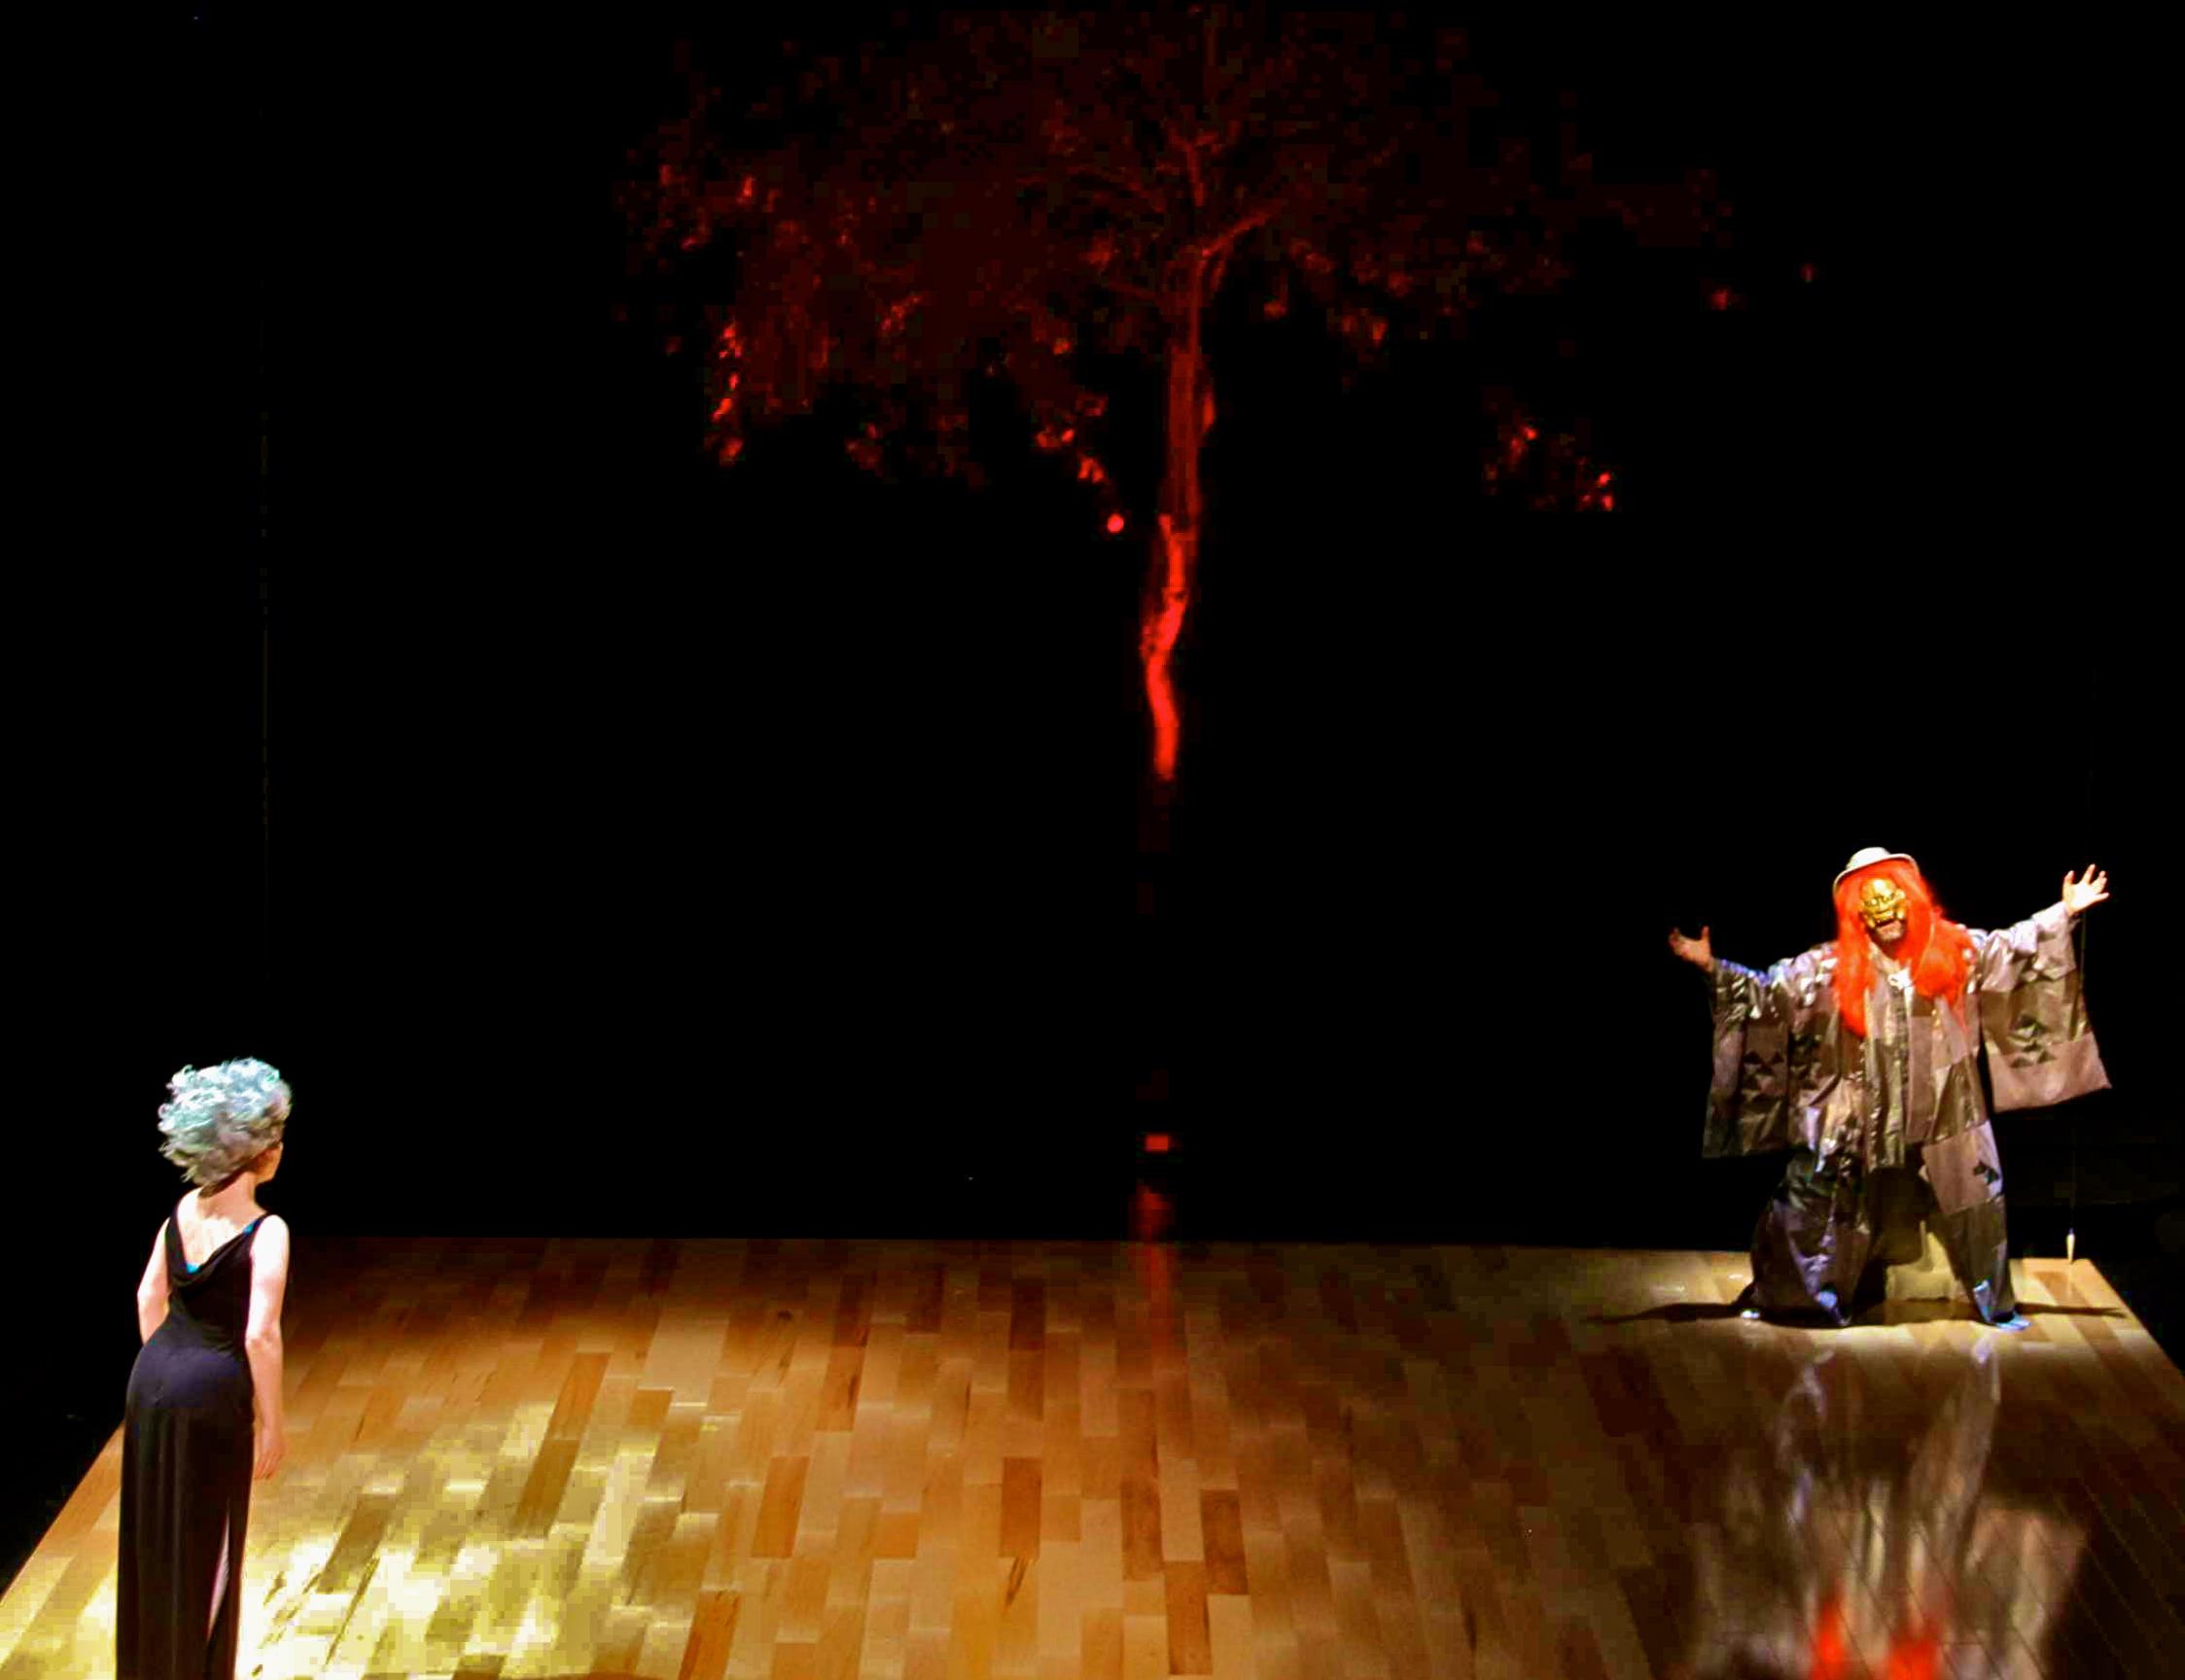 this-lingering-life-chiori-miyagawa-jubilith-moore-allen-willner-devil.jpg